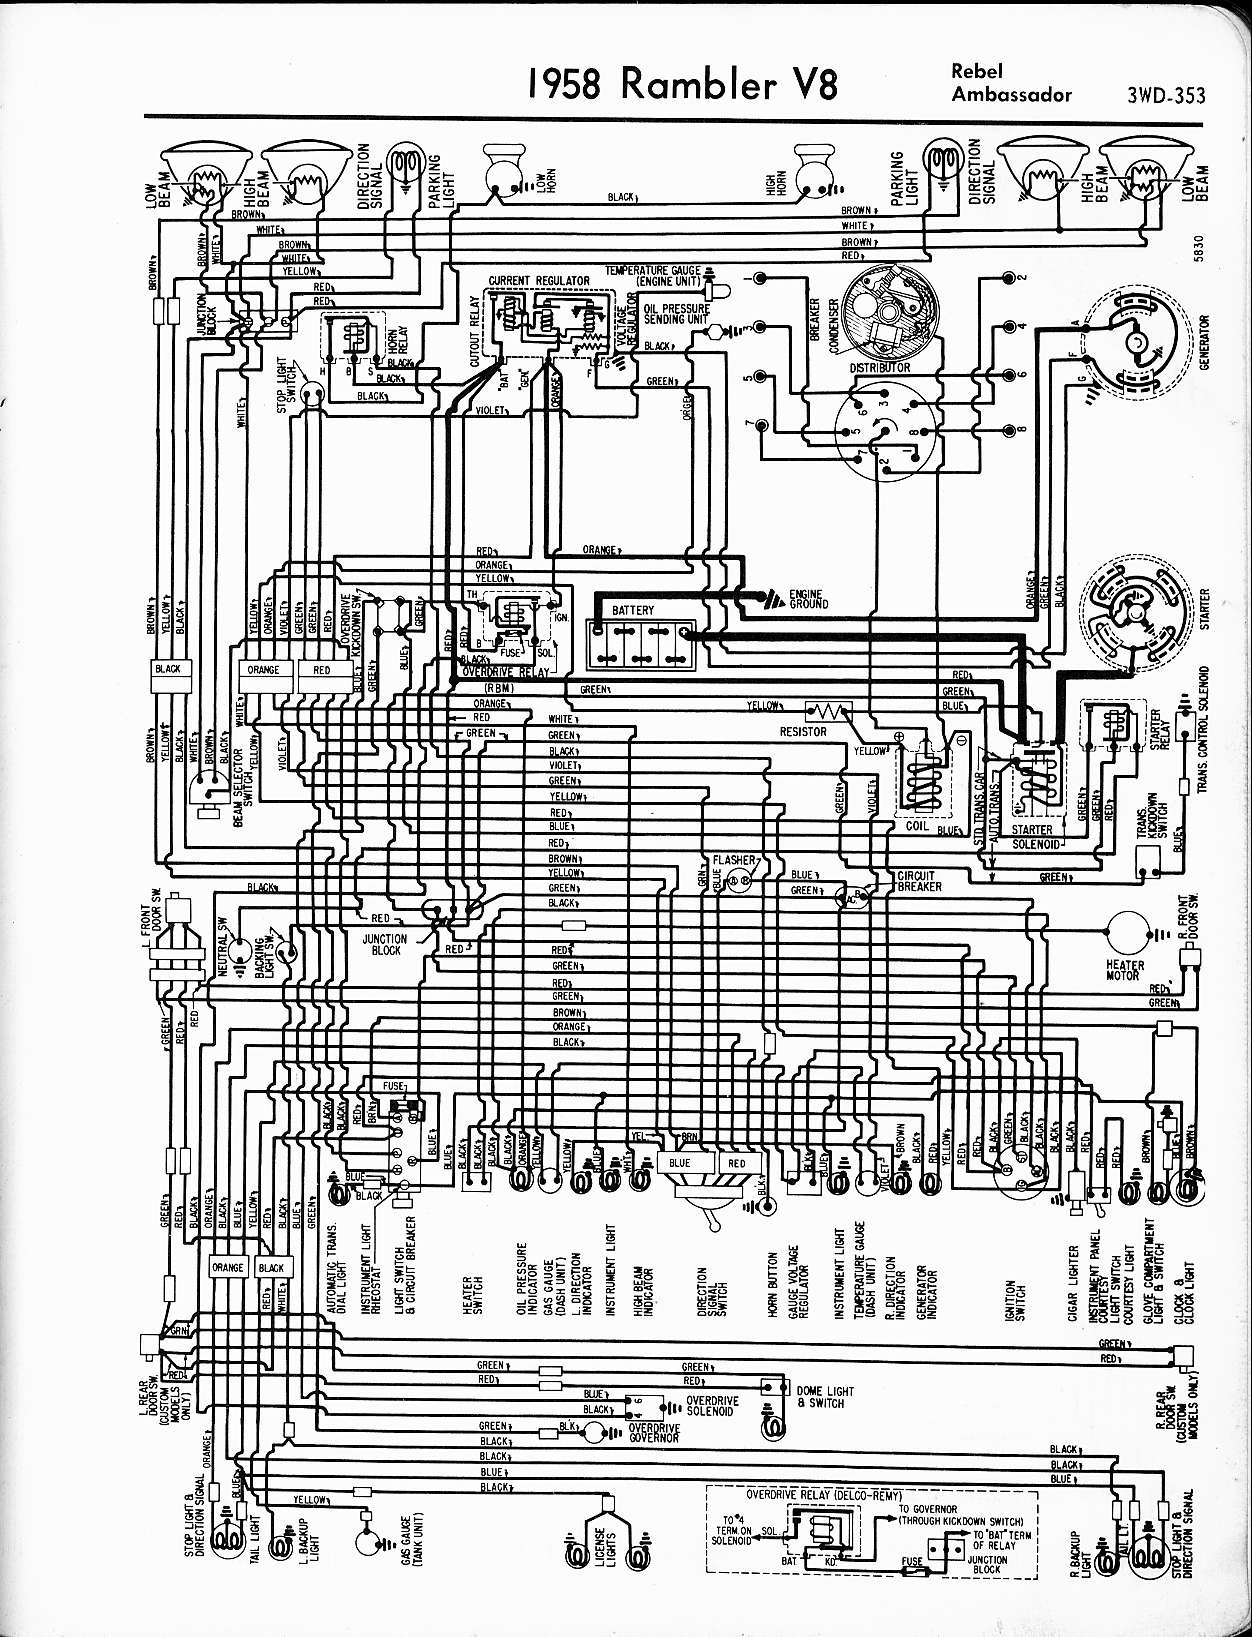 Phenomenal Rambler Wiring Diagrams The Old Car Manual Project Wiring Cloud Xortanetembamohammedshrineorg